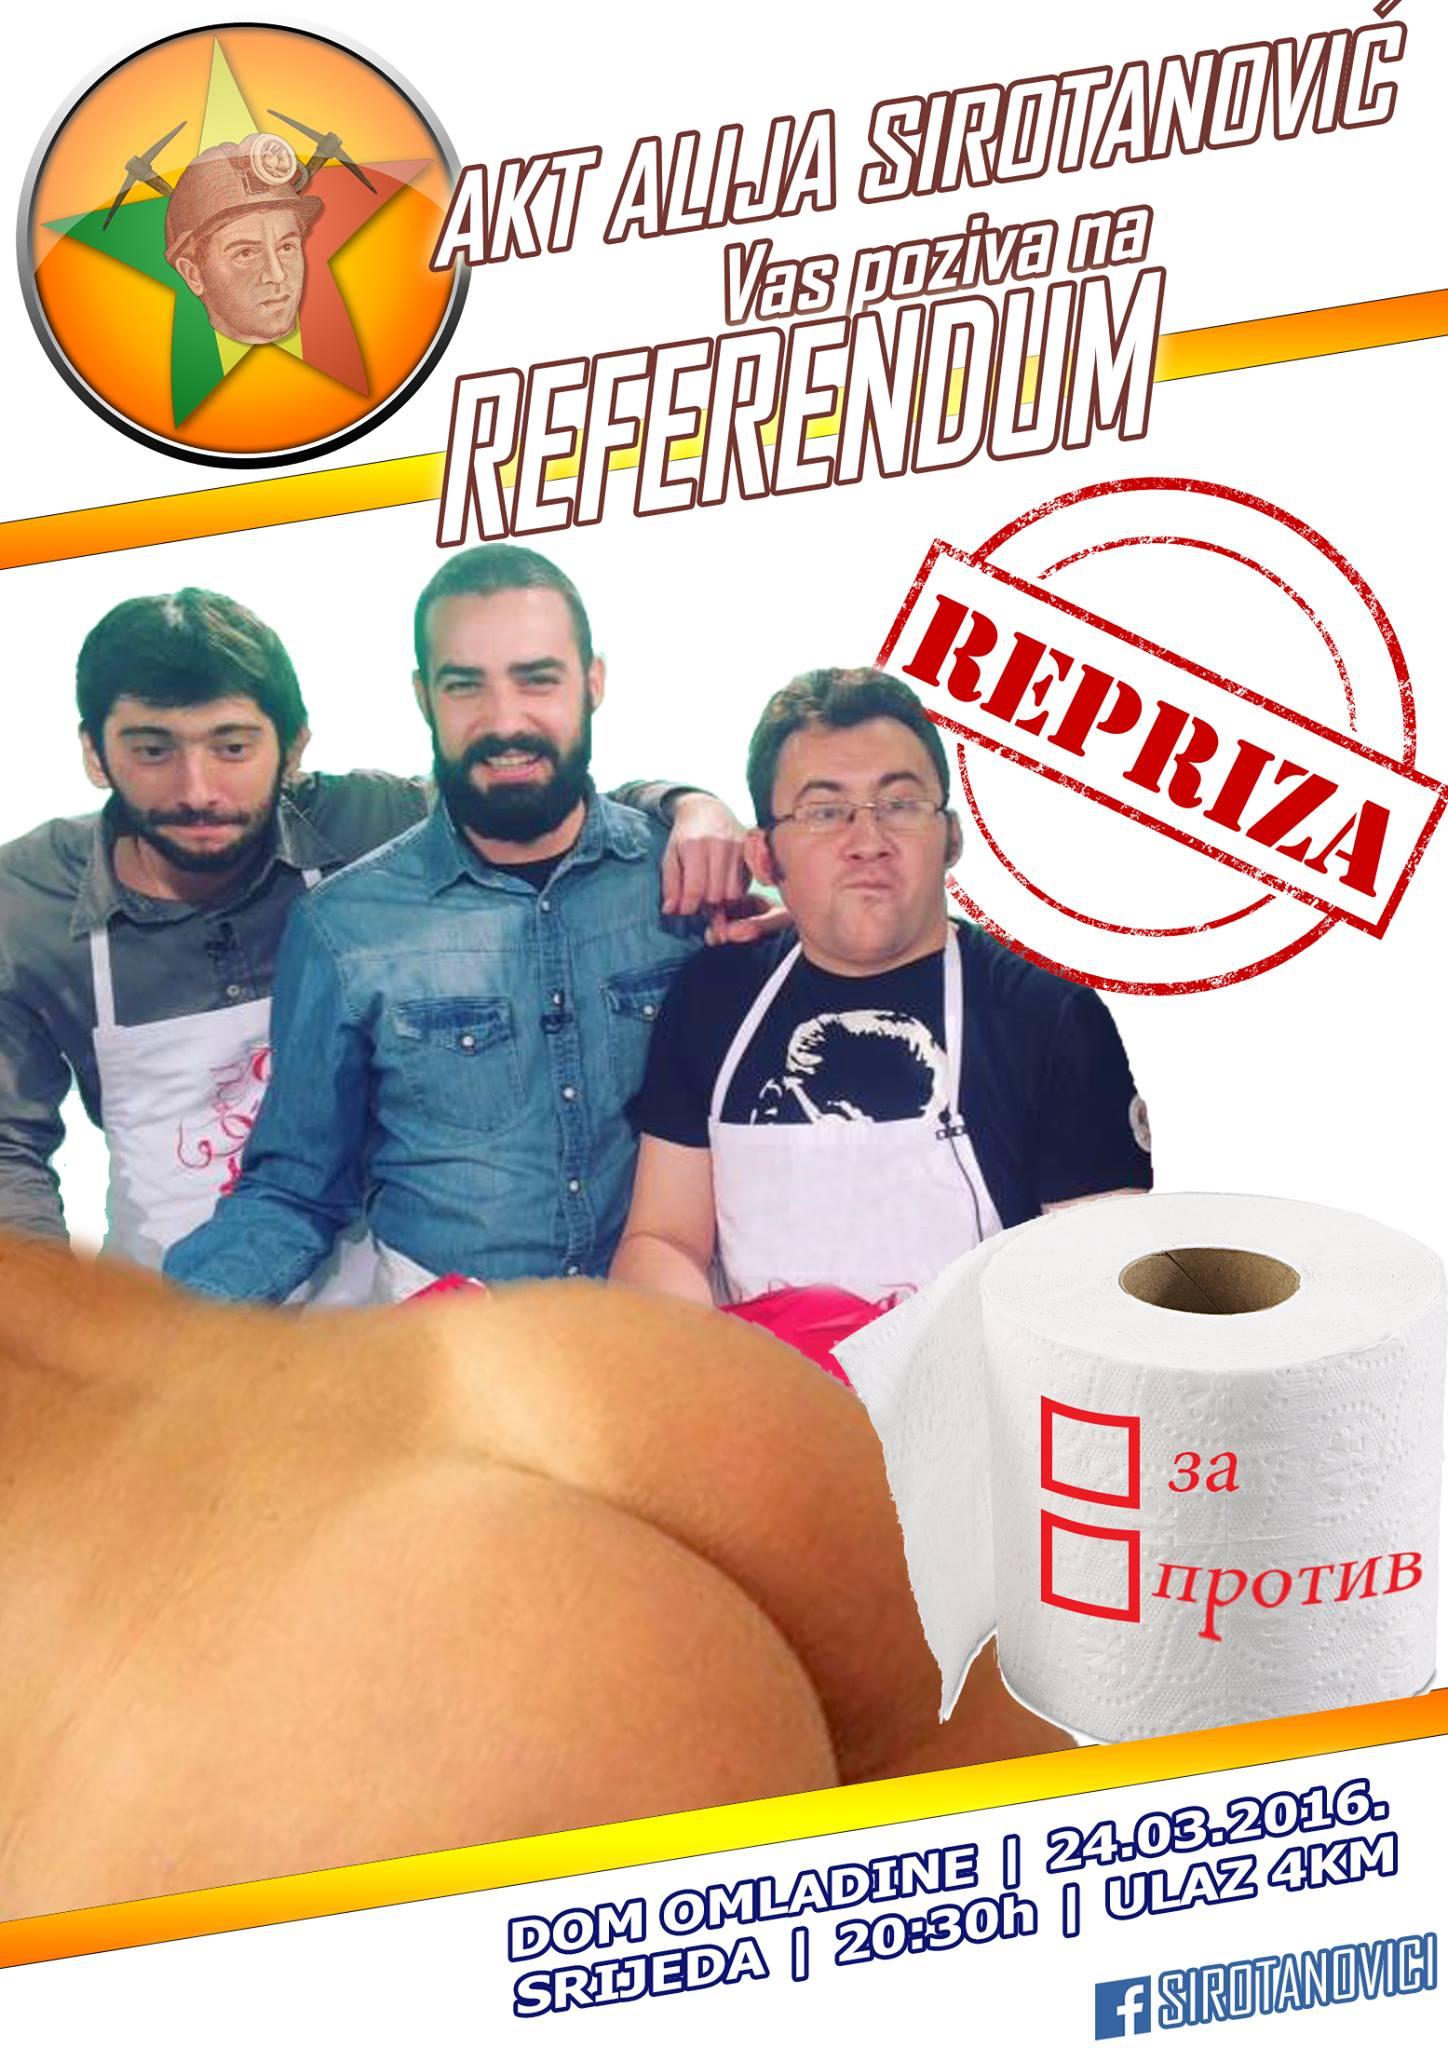 Referendum - repriza